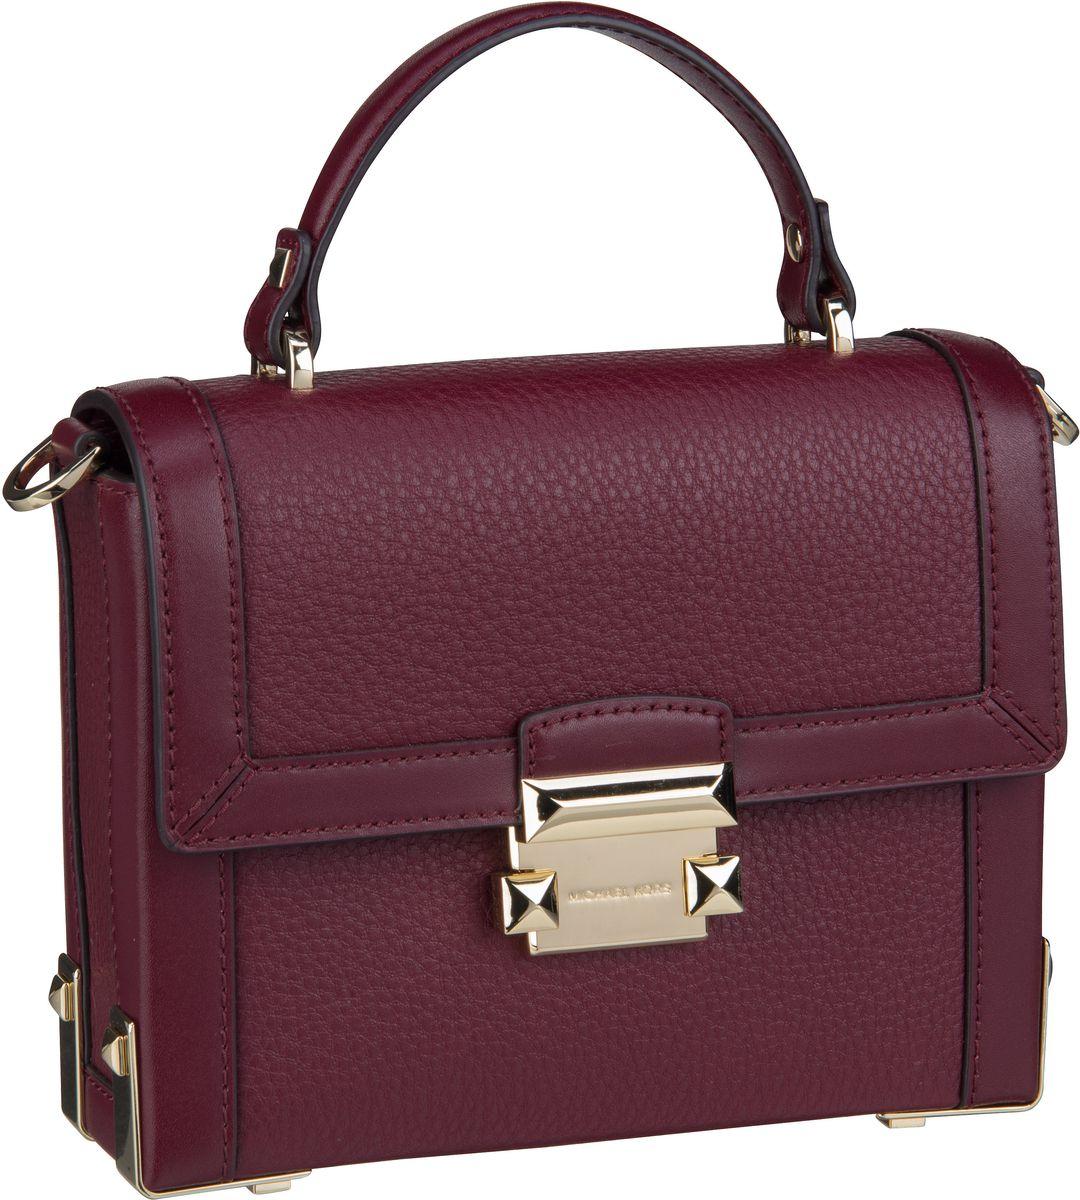 Michael Kors Handtasche Jayne Small Trunk Bag Oxblood